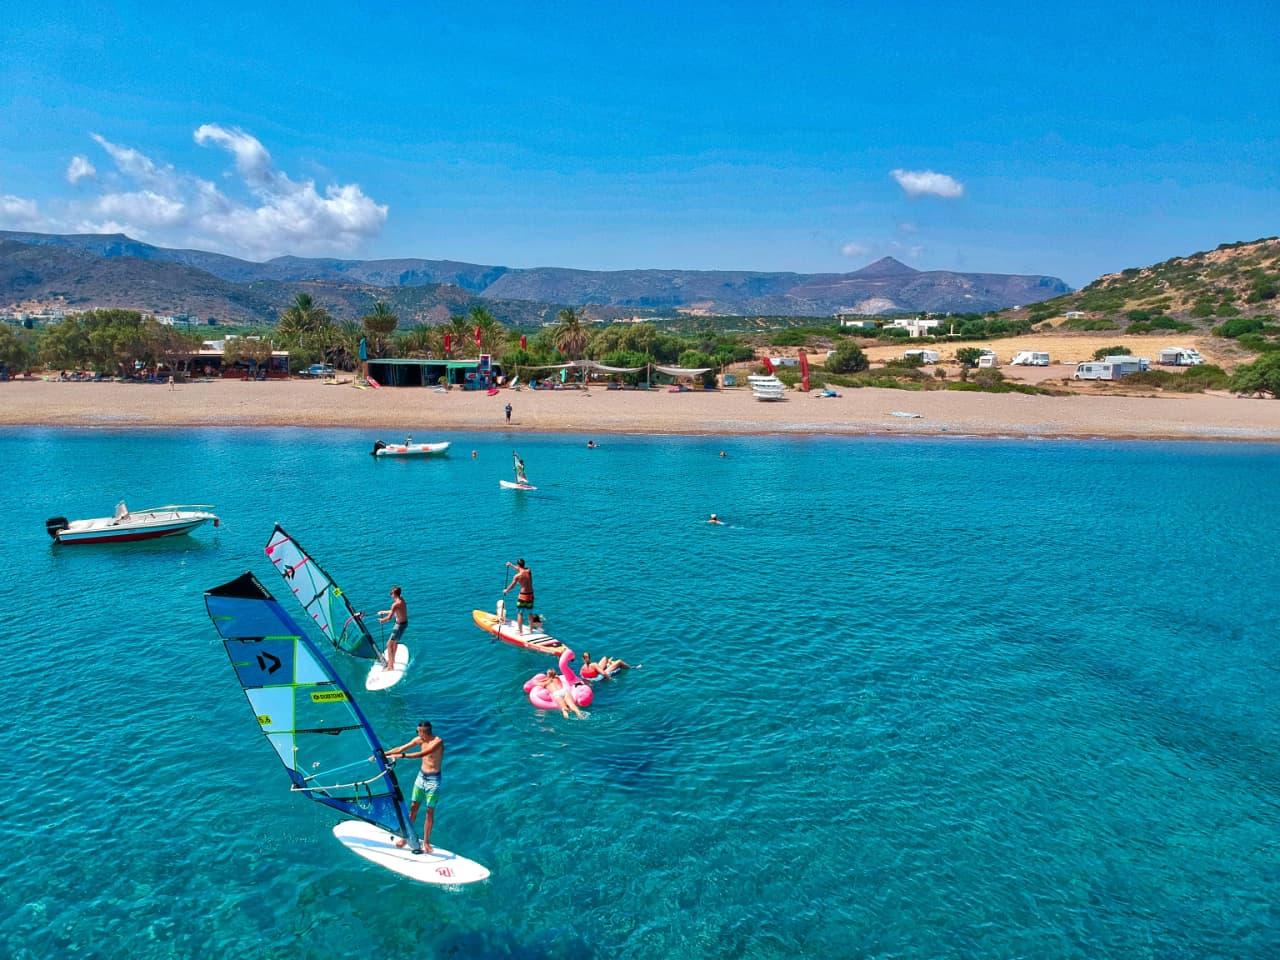 windsurfing lessons kouremenos beach, foil windsurfing lessons kouremenos, windsurfing rentals, foil windsurfing rentals east crete, kouremenos beach best place for windsurfing, best windsurfing center crete, best equipment for windsurfing crete